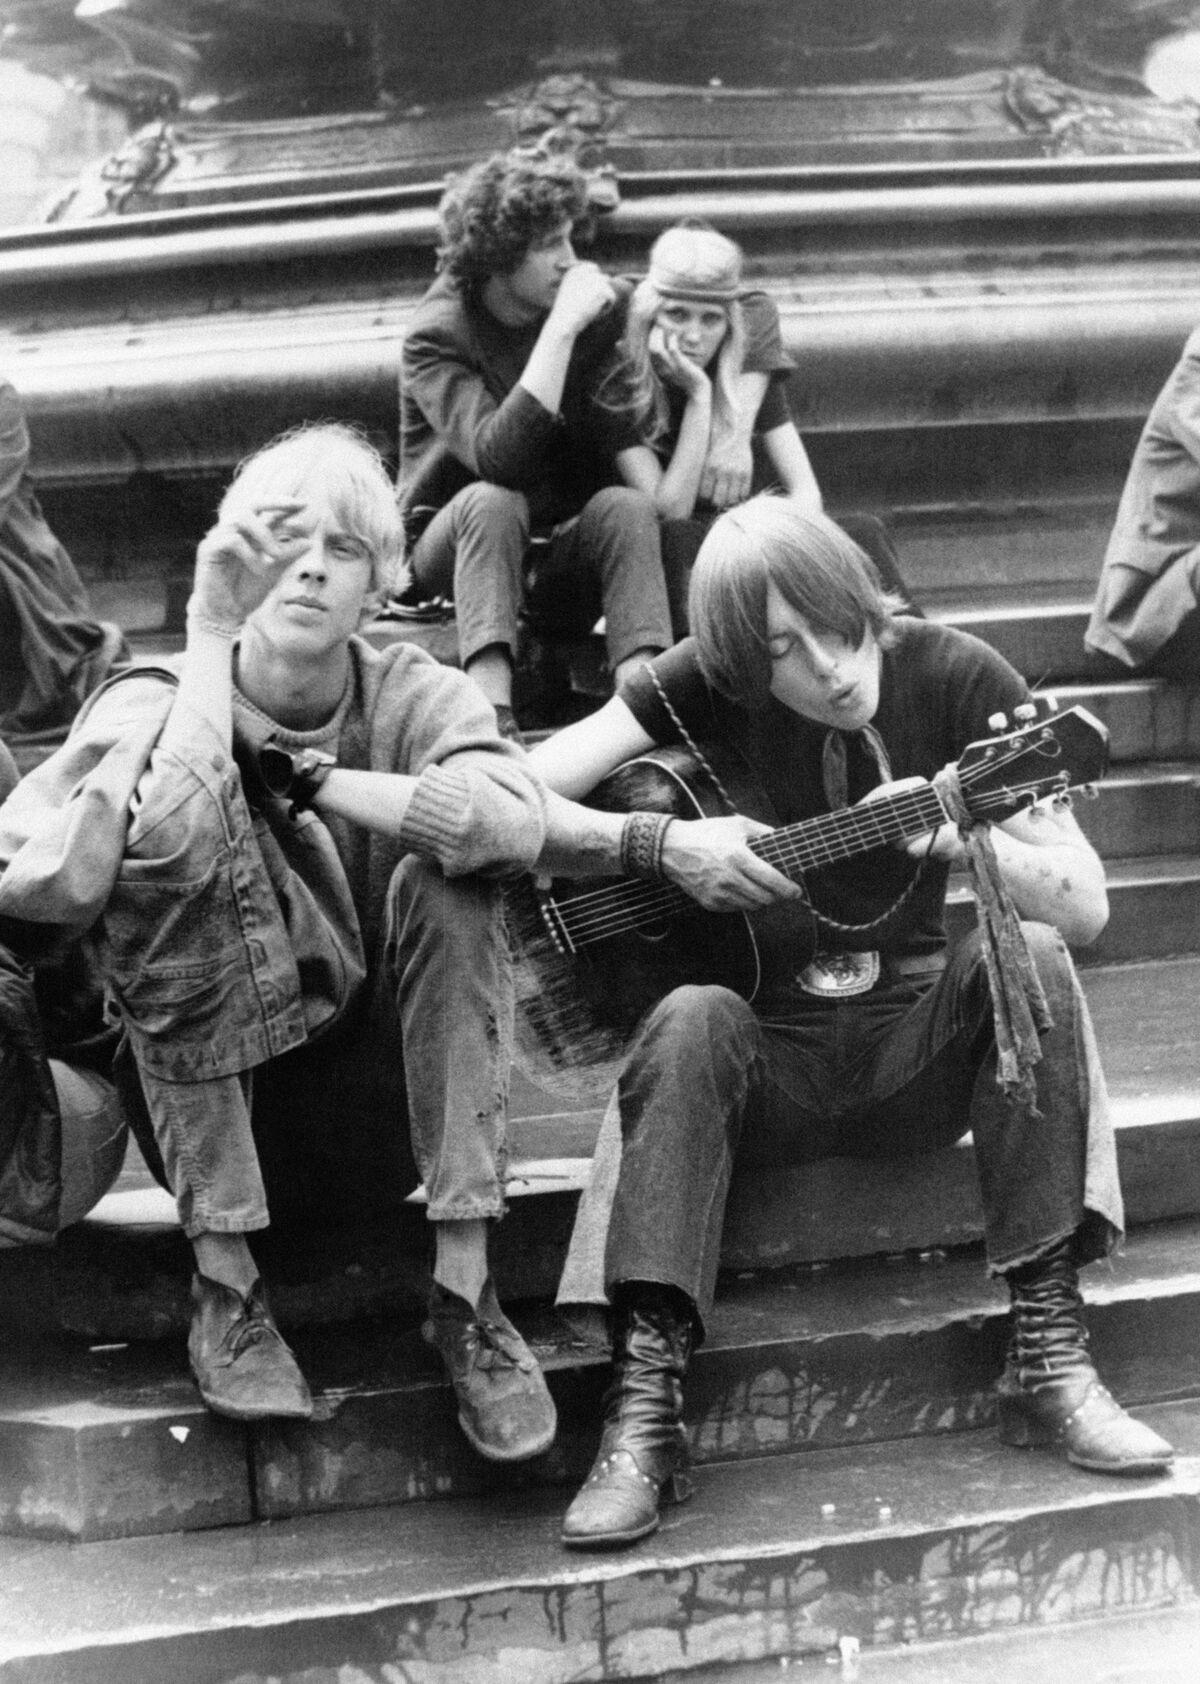 Beatniks in London, 1969. Photo by KEYSTONE-FRANCE/Gamma-Rapho via Getty Images.